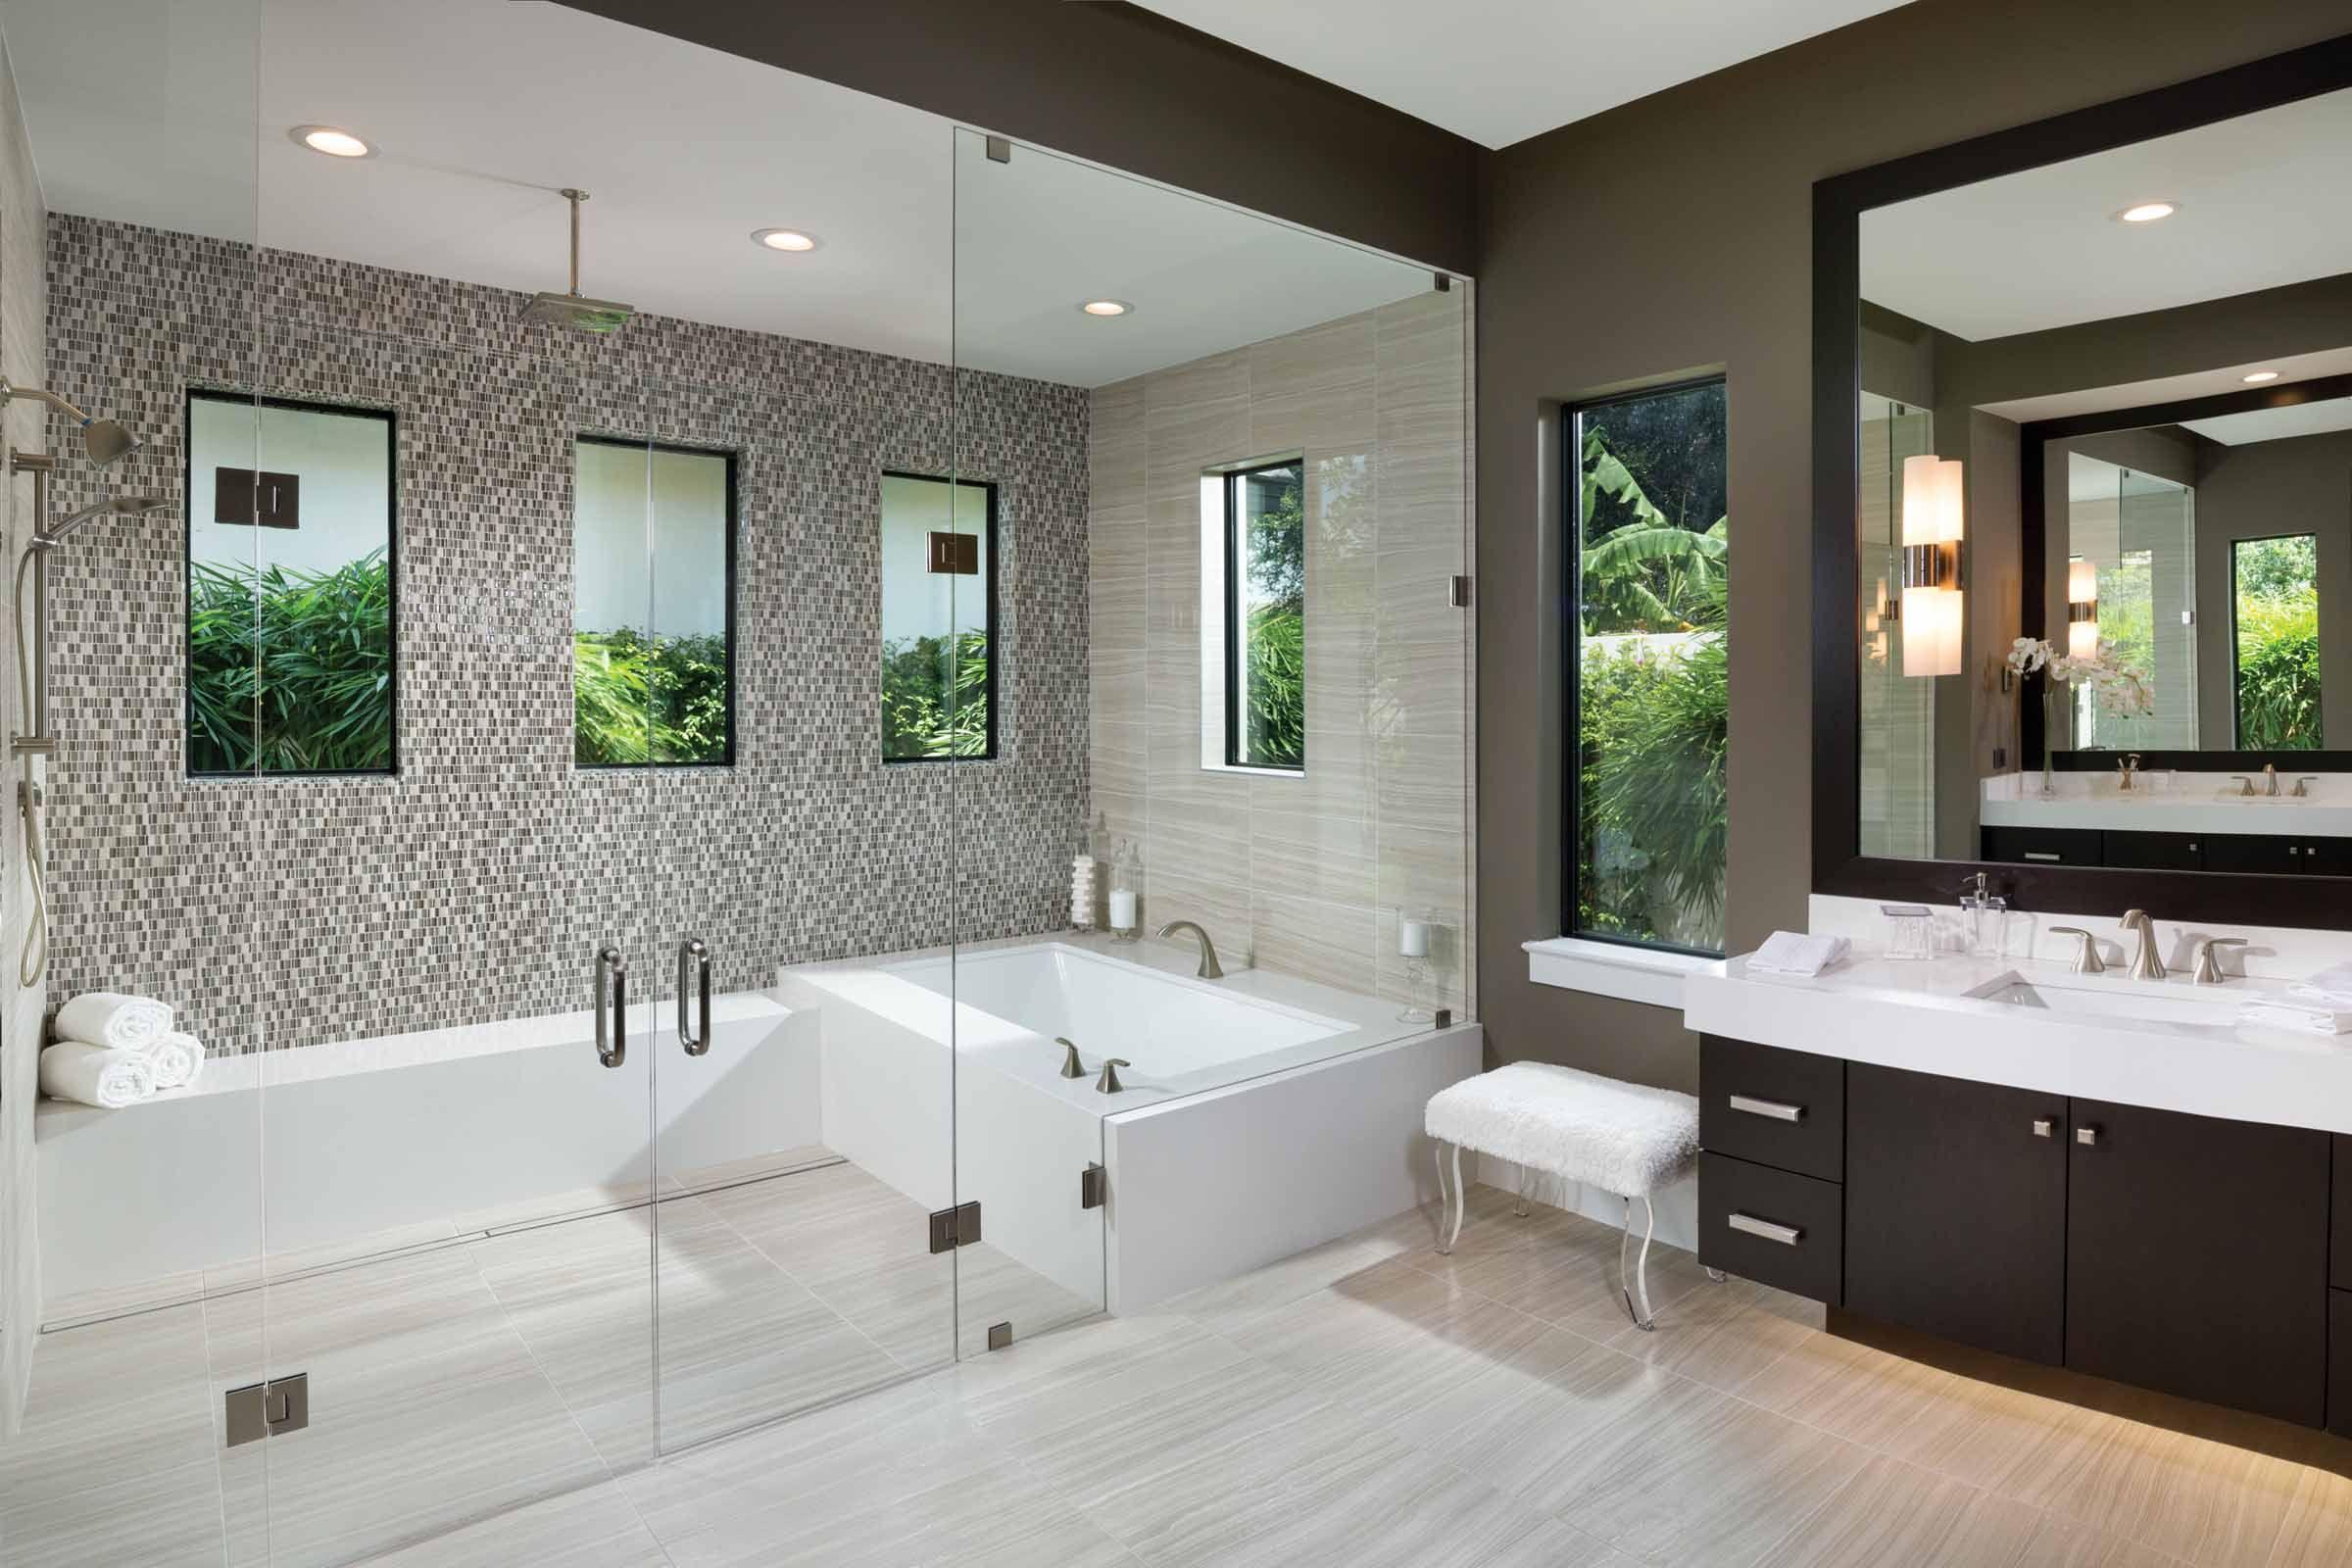 Wet Room Bathroom Master Bedroom Bathroom Master Baths Tub Shower bo Bathtub